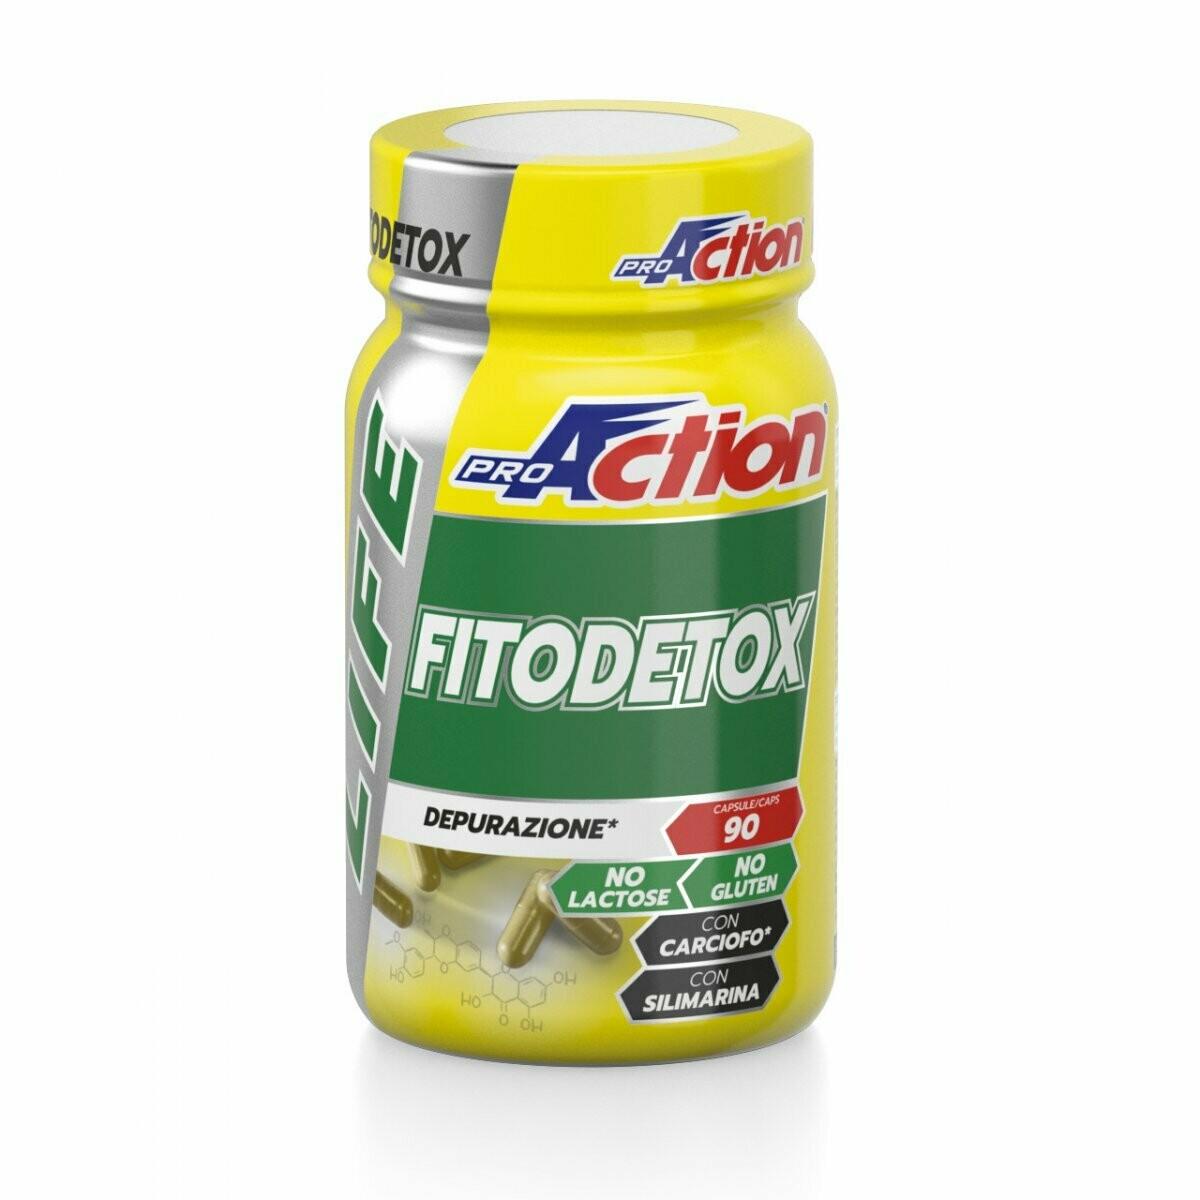 Life Fitodetox 90 compresse